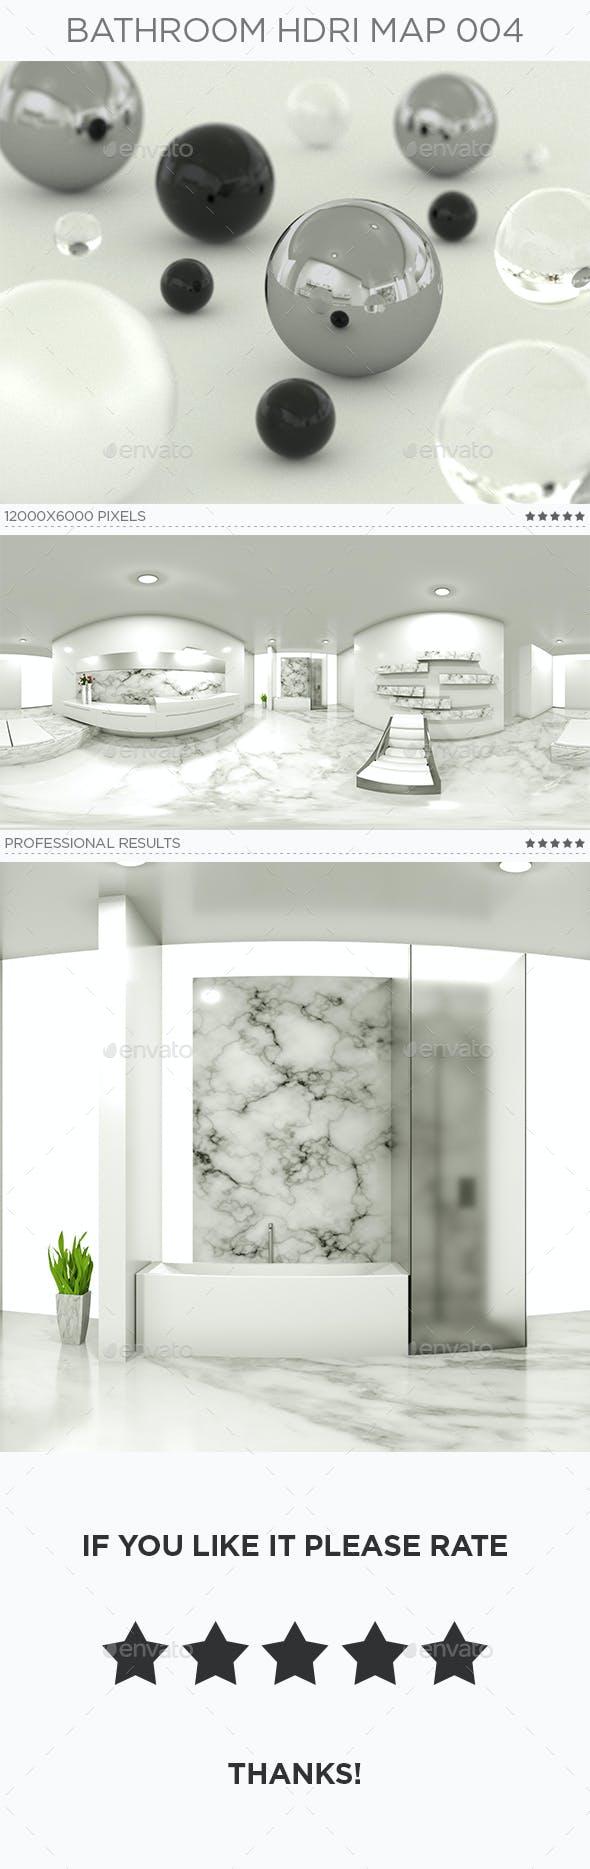 Bathroom HDRi Map 004 - 3DOcean Item for Sale